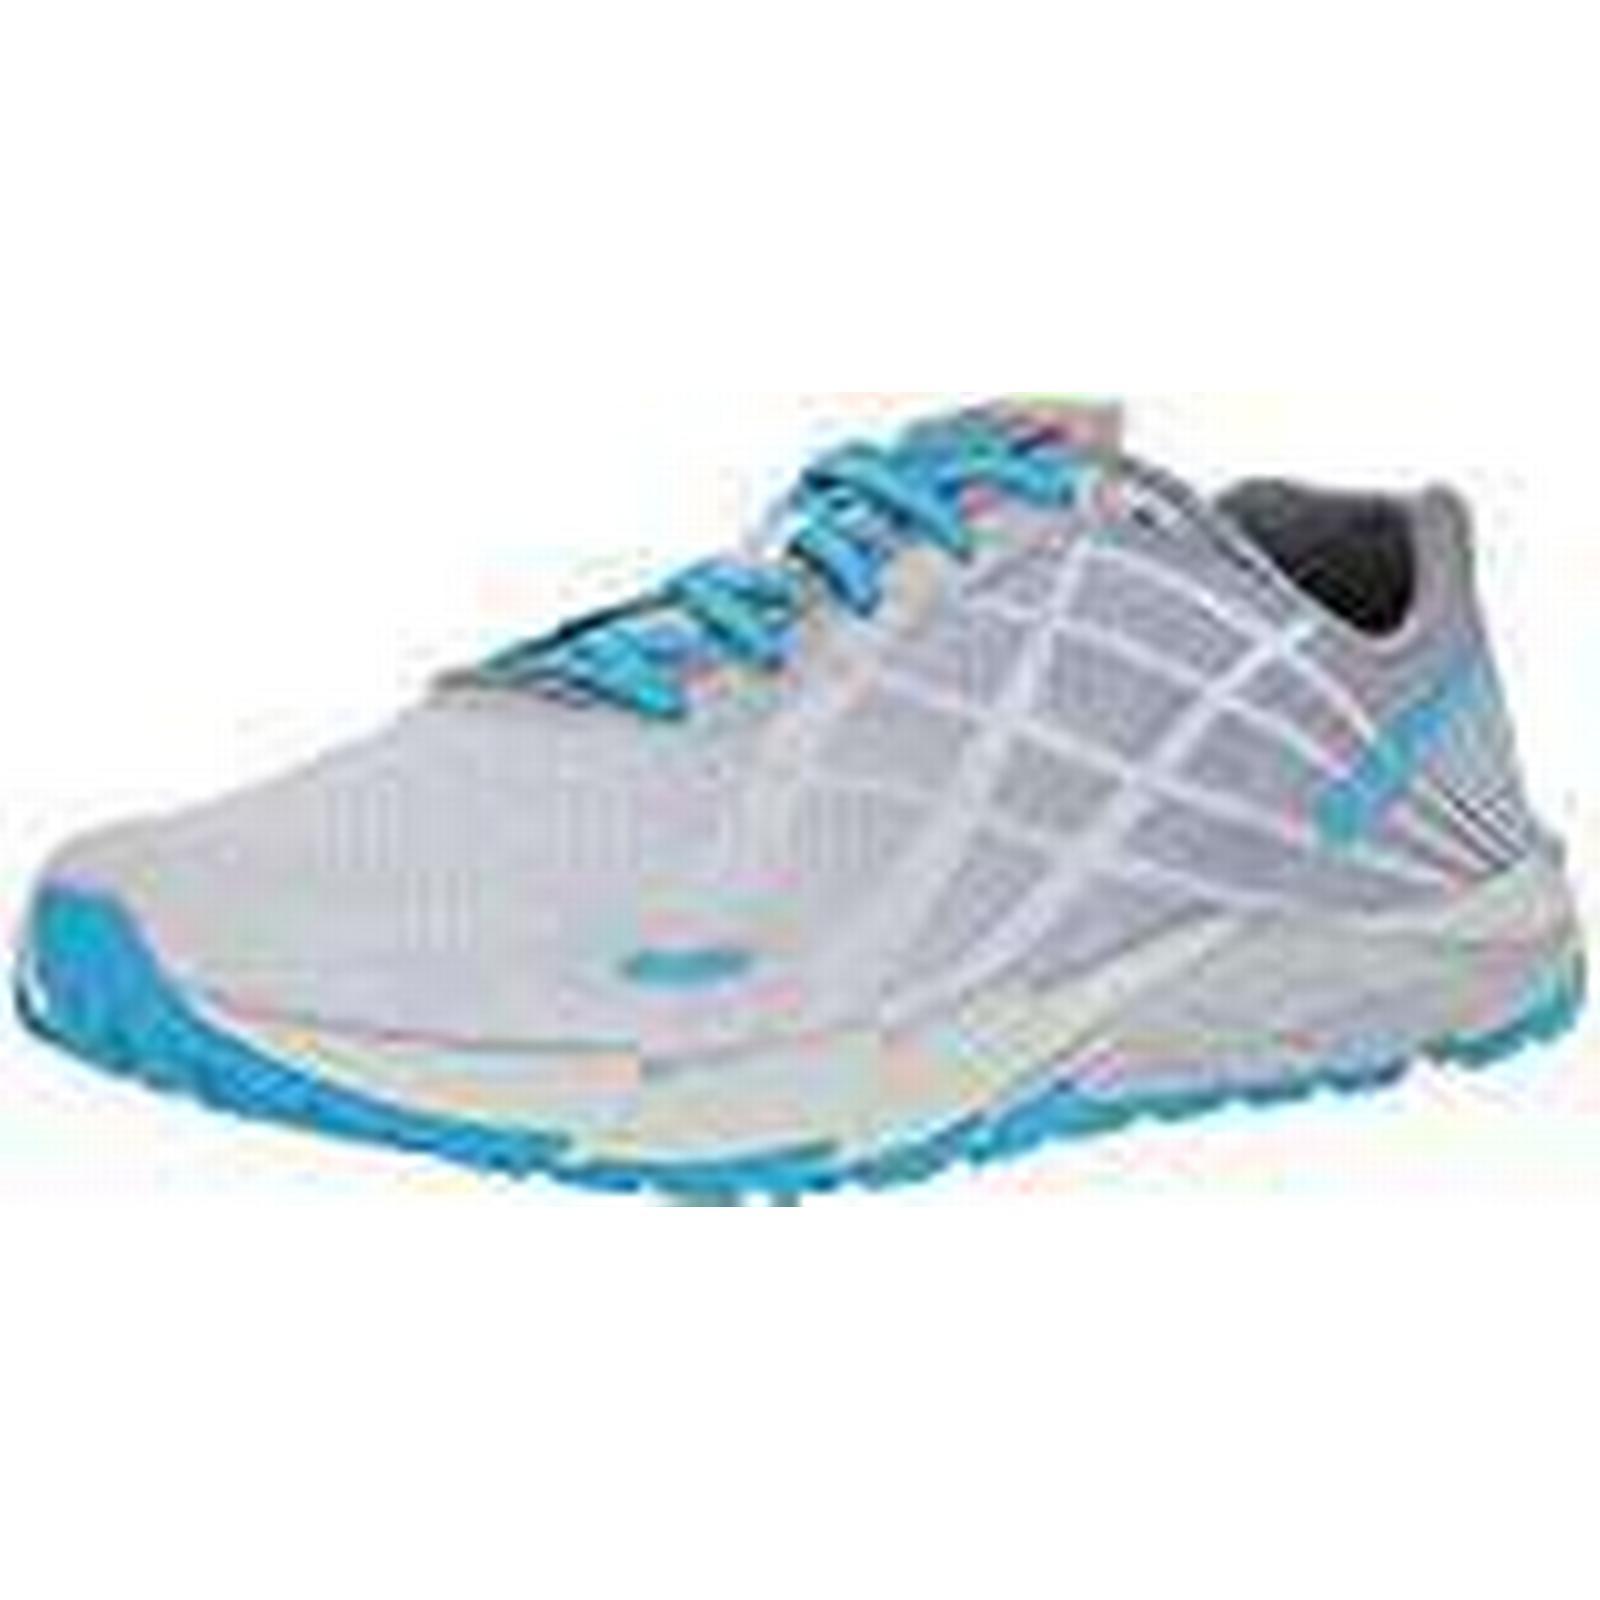 Merrell Women's 3.5 Bare Access Flex Running Shoes, White (Ice), 3.5 Women's UK 36 EU 929ac5